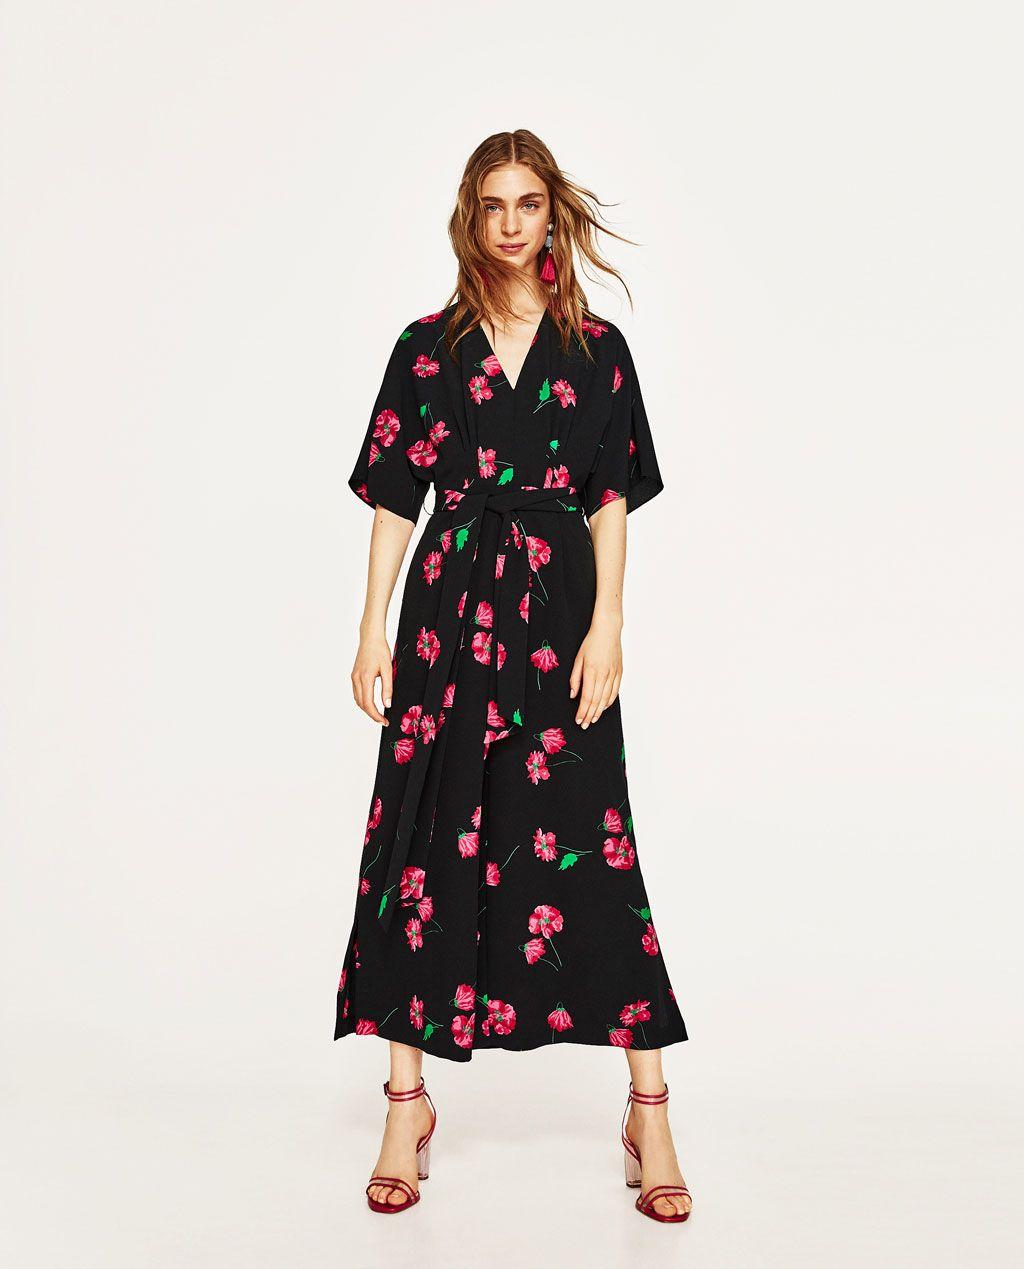 4f5f9d12 MONO ESTAMPADO FLORAL   Vestidos   Floral jumpsuit, Zara jumpsuit ...